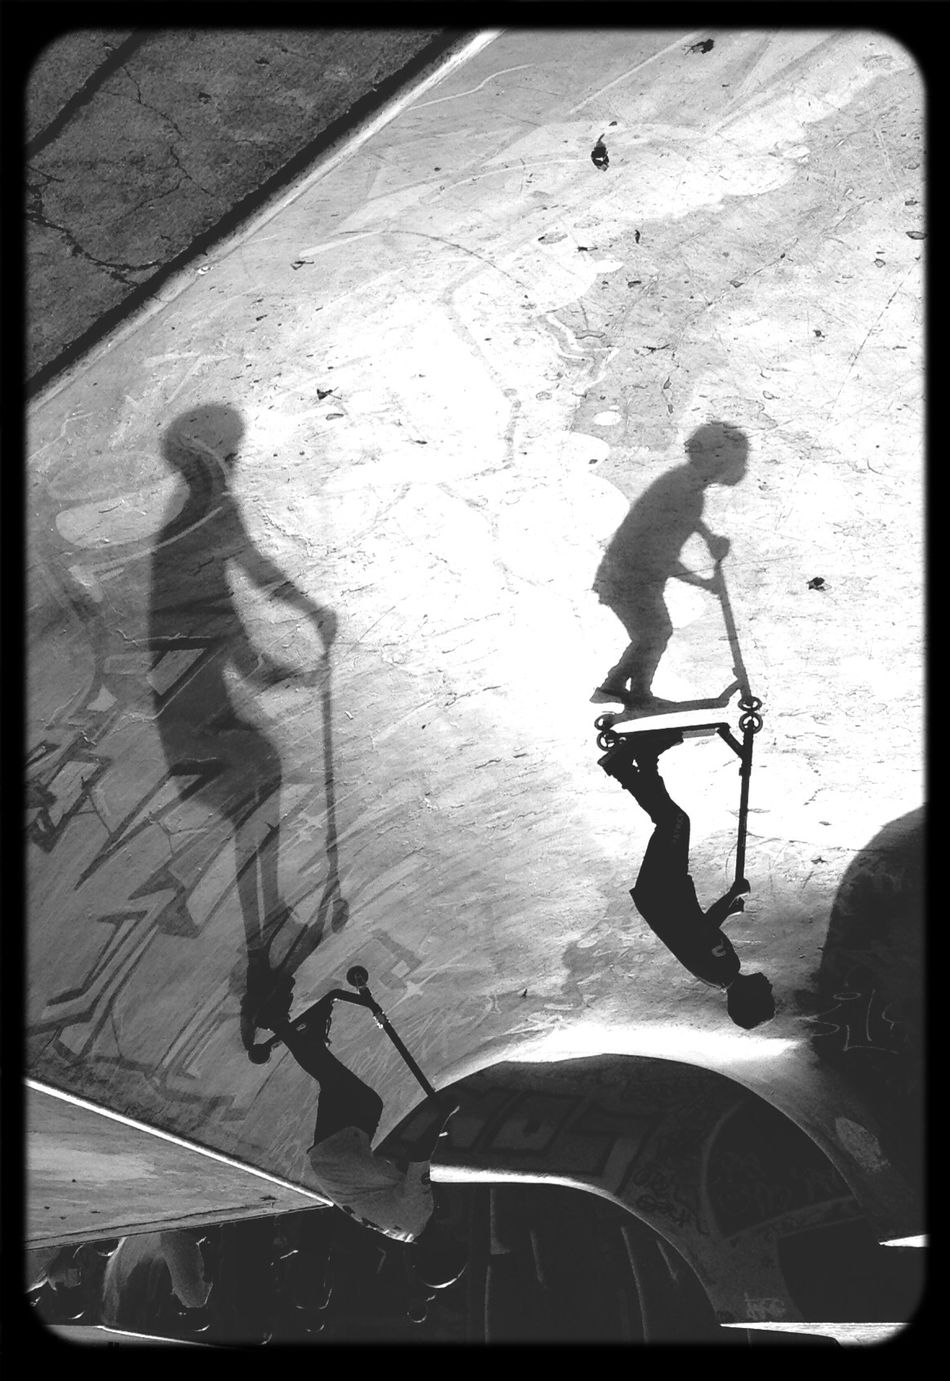 Monochrome Black And White Skateboarding Enjoying Life